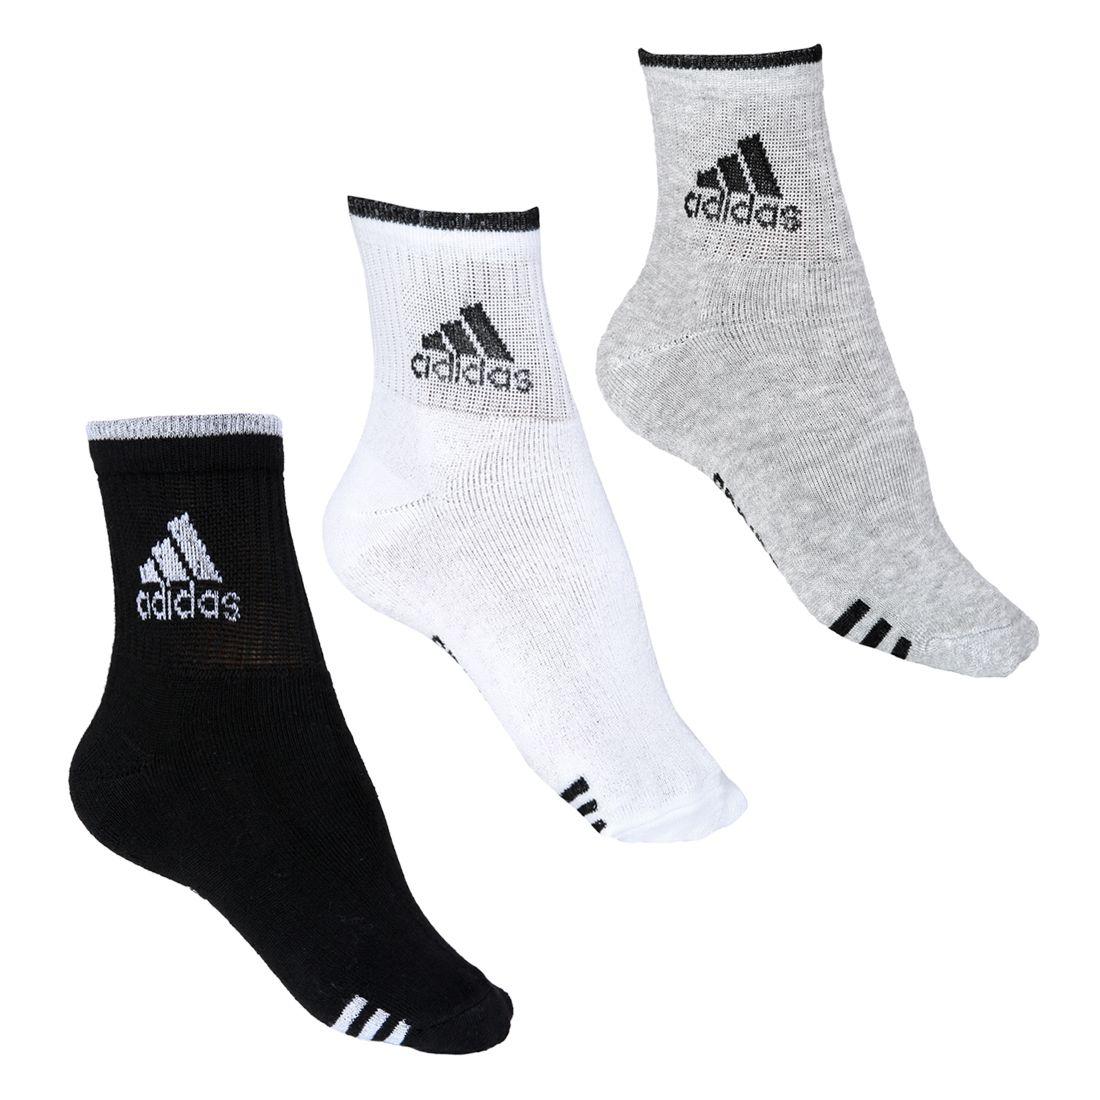 ANIXA Multi Sports Ankle Length Socks